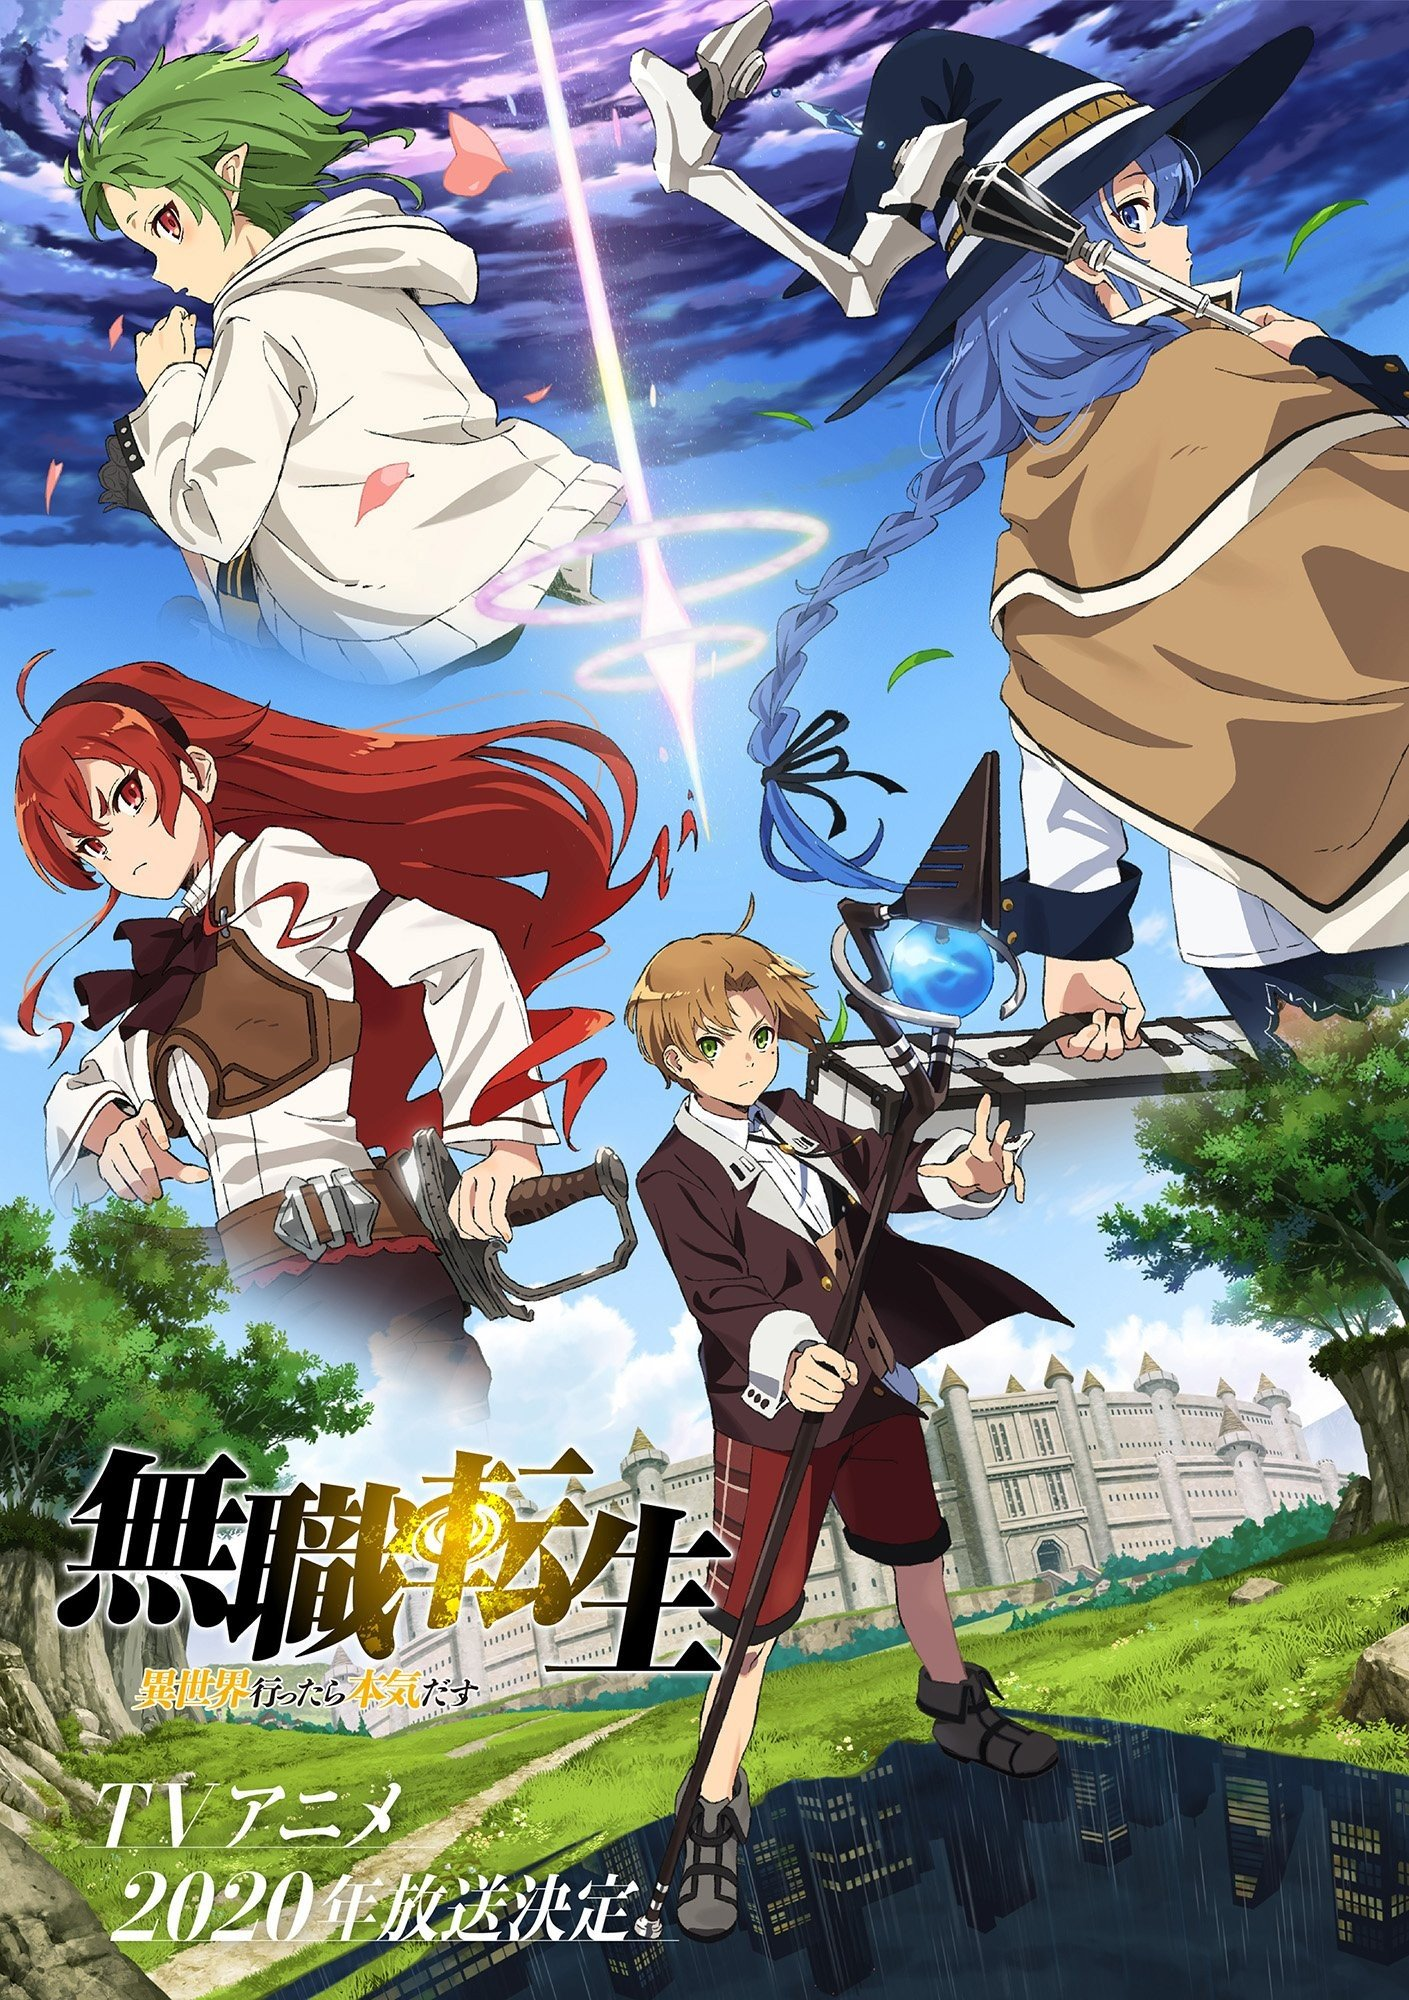 https://mirai.ai/wp-content/uploads/Mushoku-Tensei-Isekai-Ittara-Honki-Dasu-1.jpg